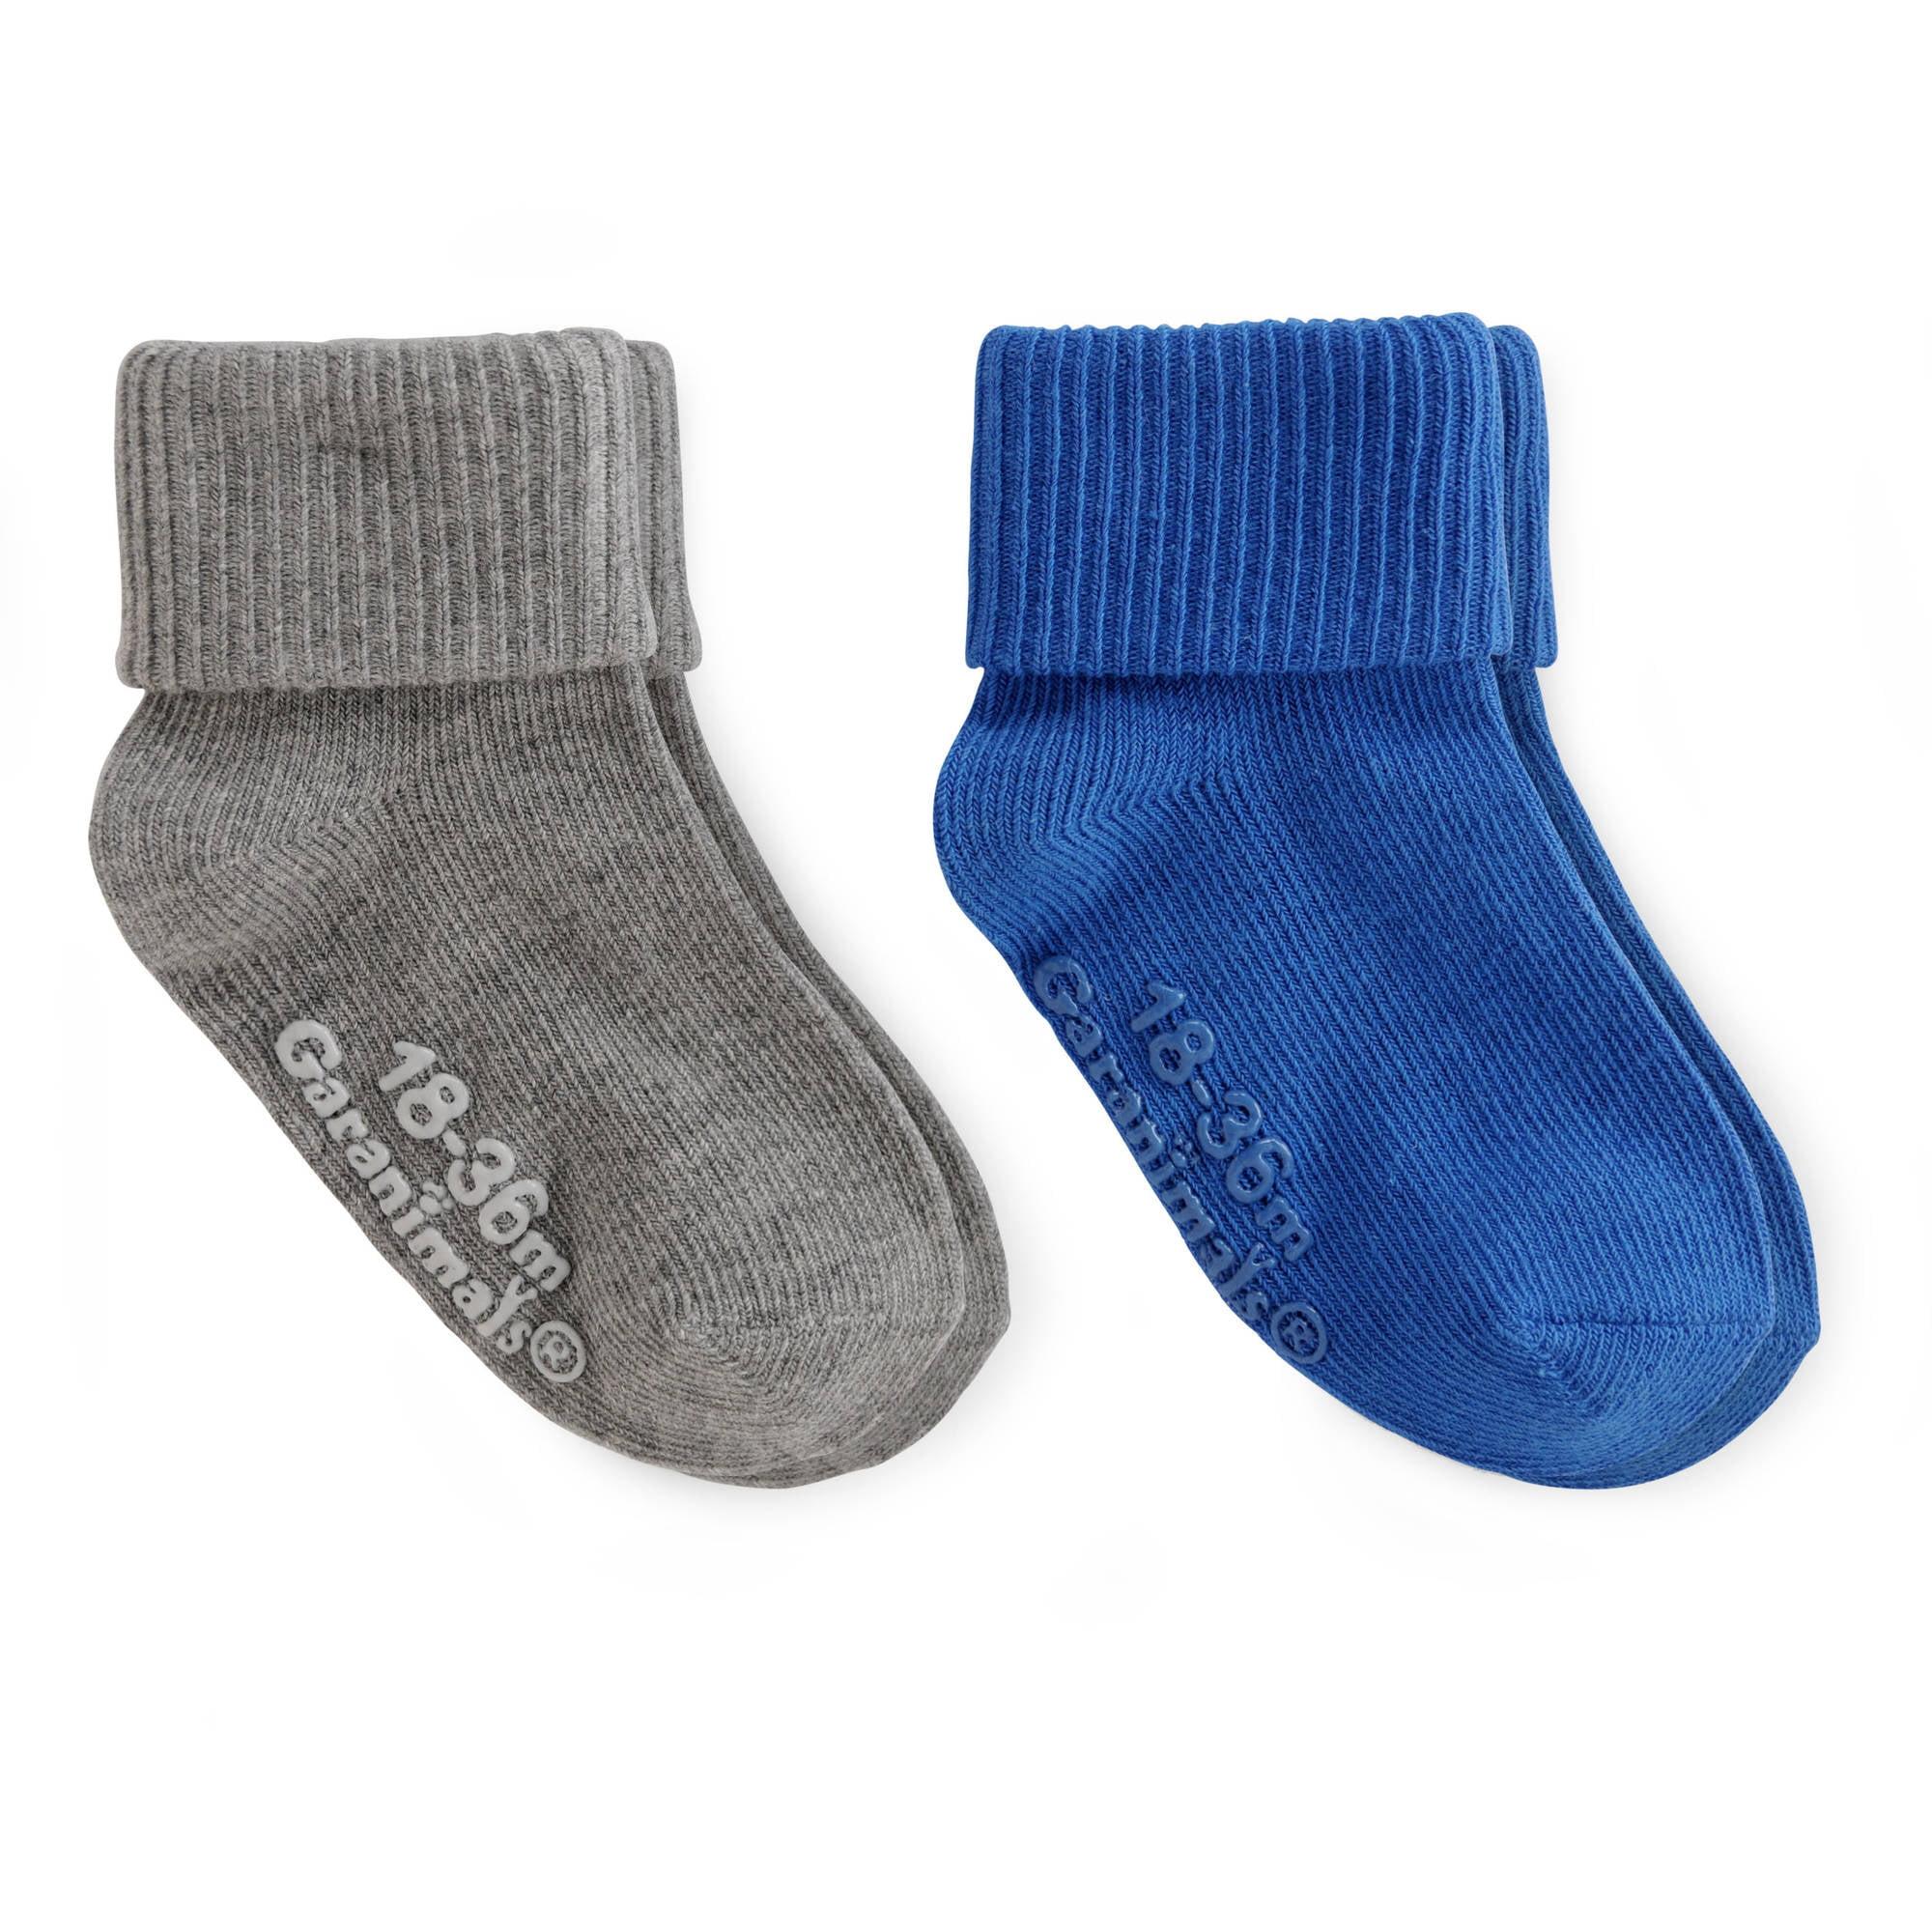 Garanimals Baby Toddler Boy Grey Blue Gripper Socks Ages NB-5T, 2-Pack